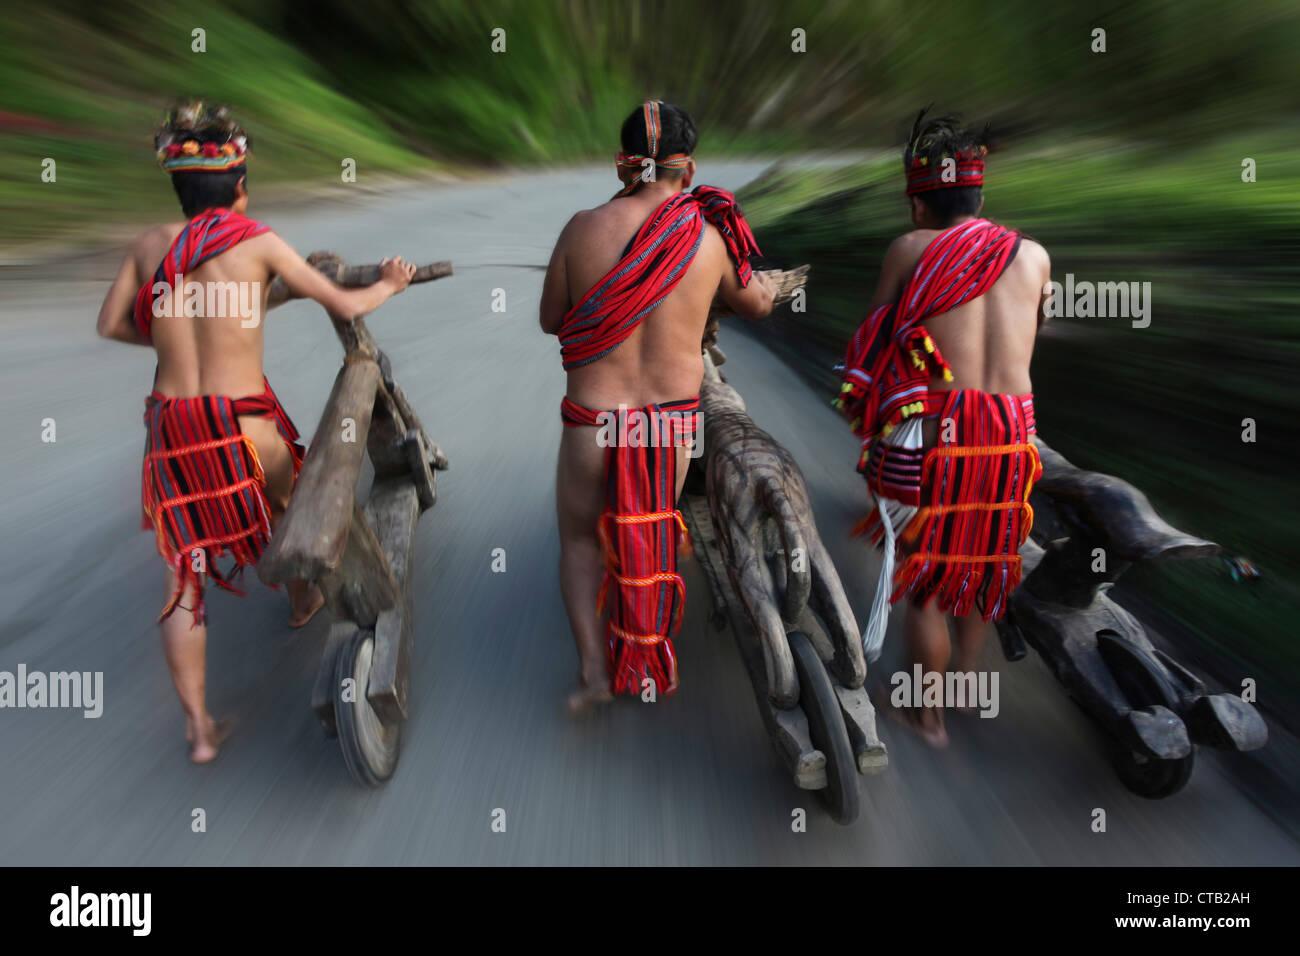 Ifugao men speeding on wooden scooters, Banaue, Ifugao, Luzon Island, Philippines - Stock Image